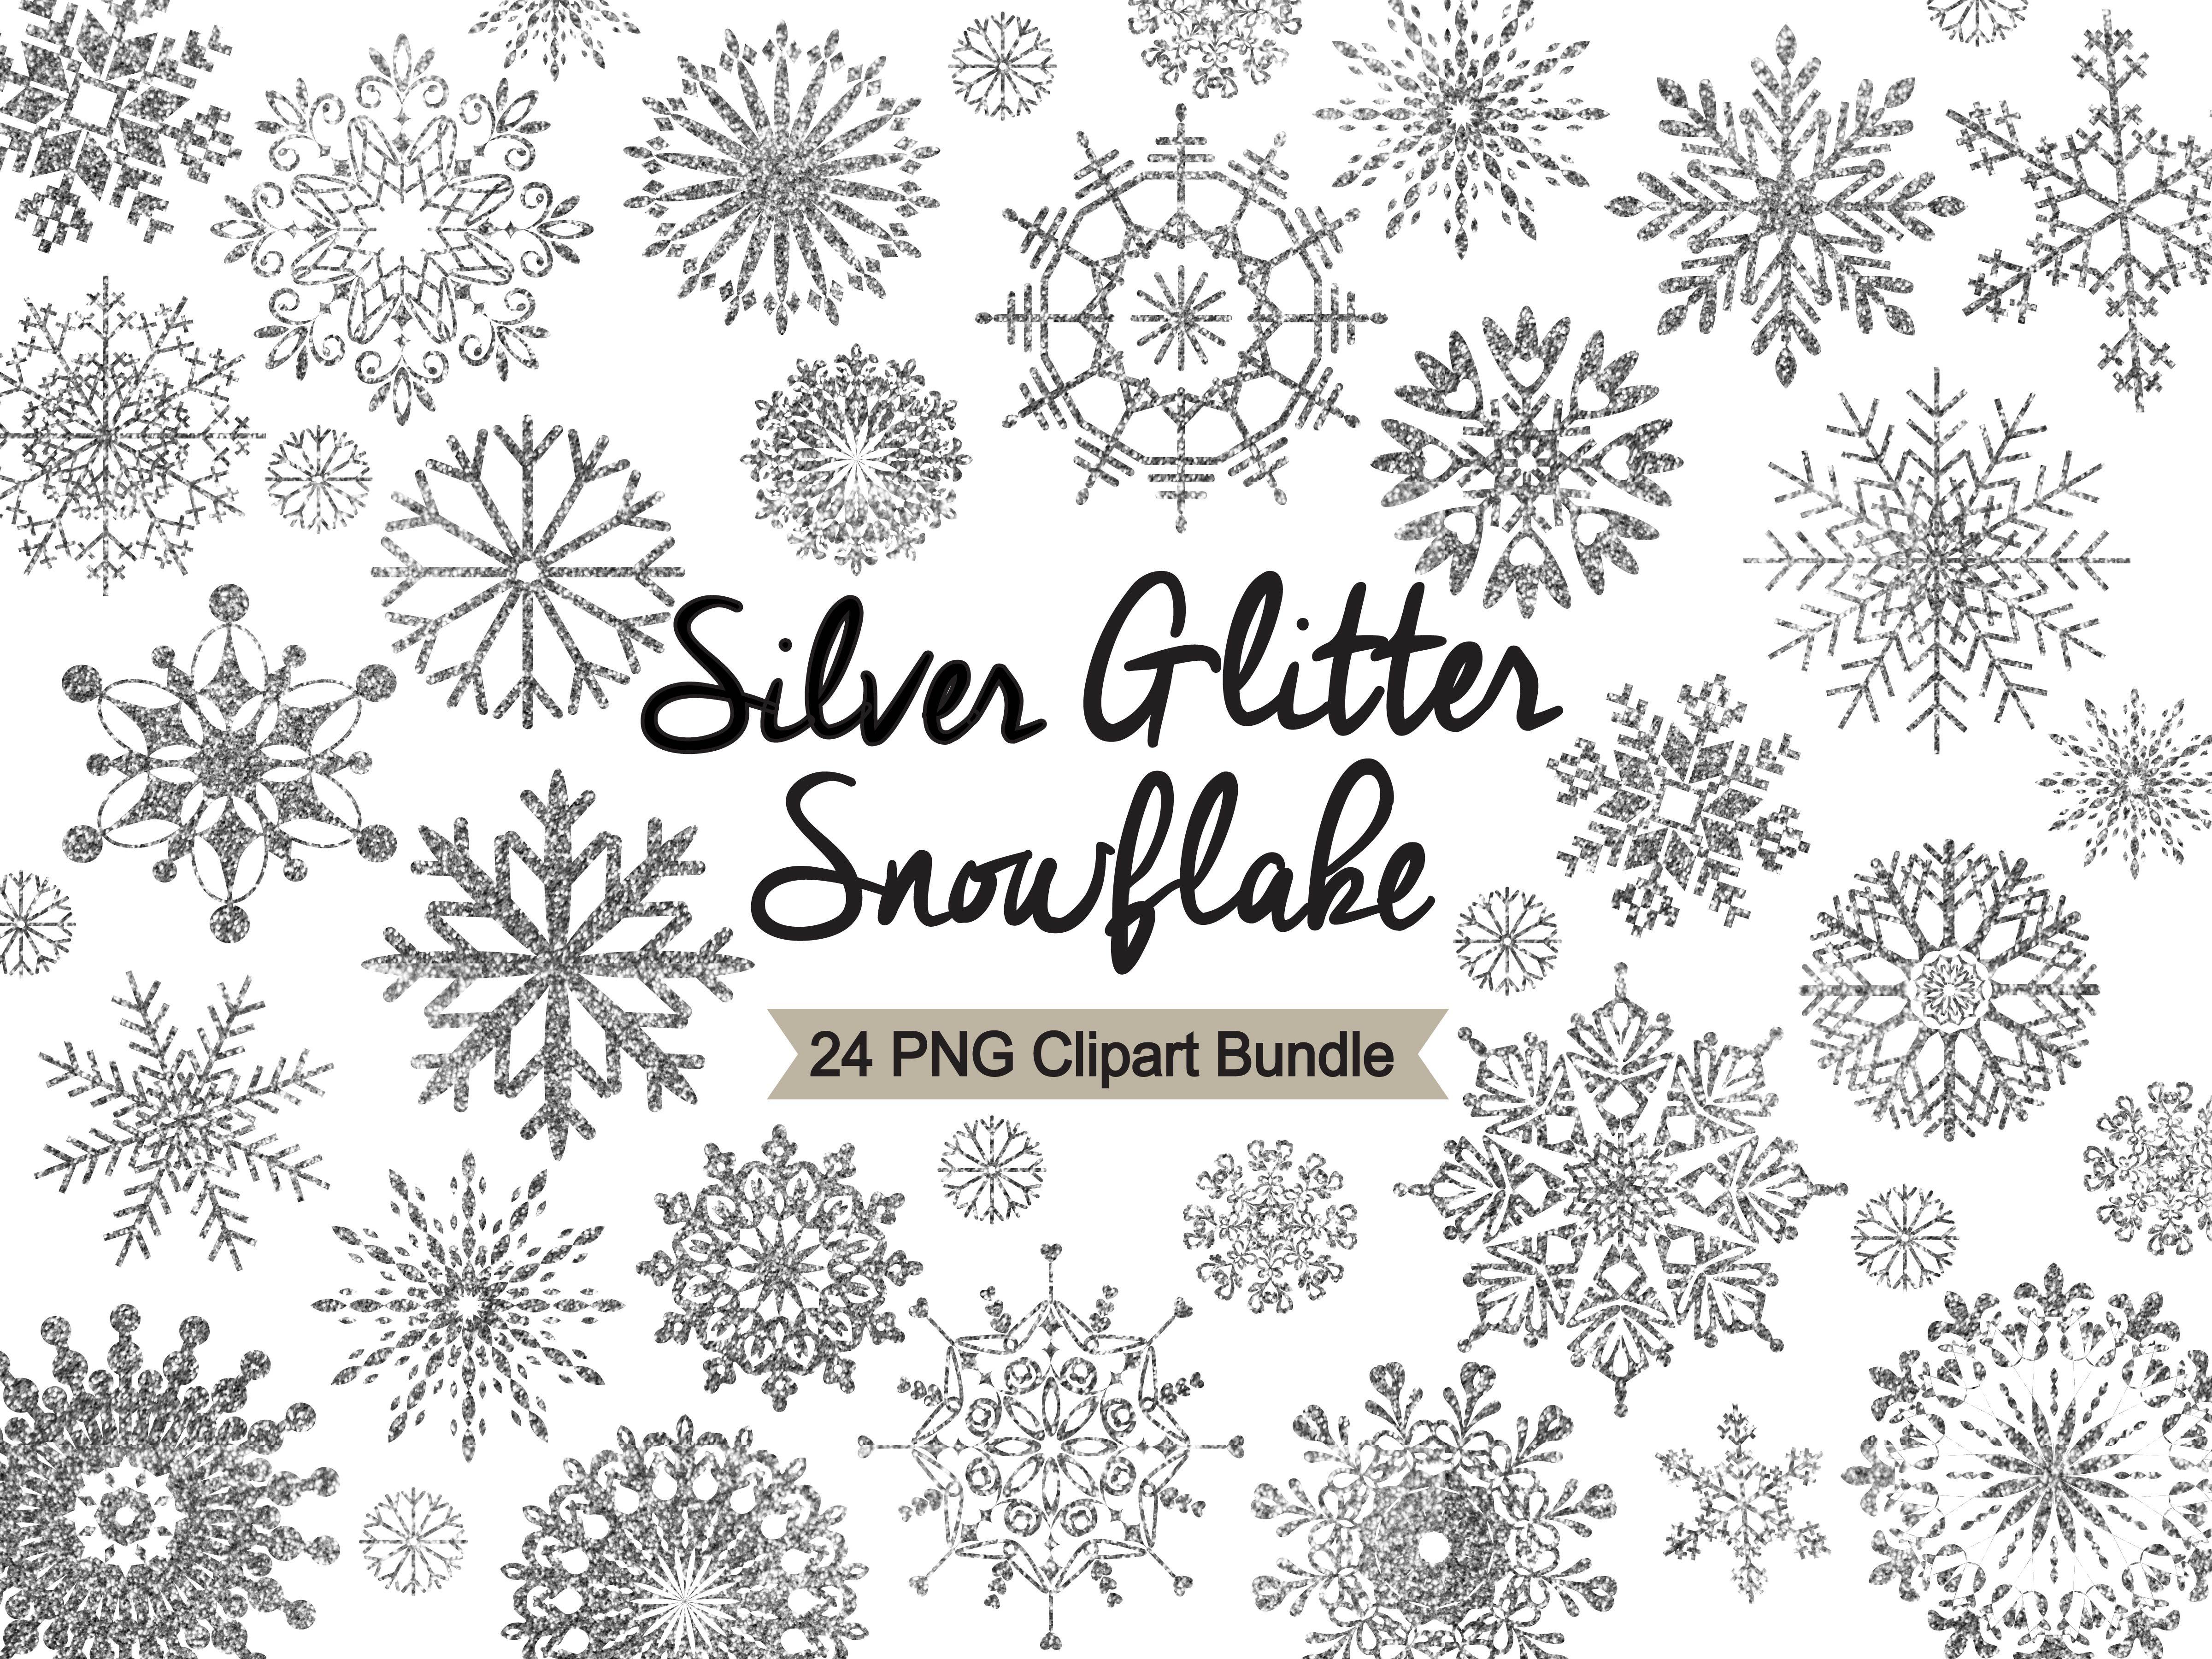 Silver Glitter Snowflake Clipart Custom Designed Illustrations Creative Market Download 309 silver glitter free vectors. creative market